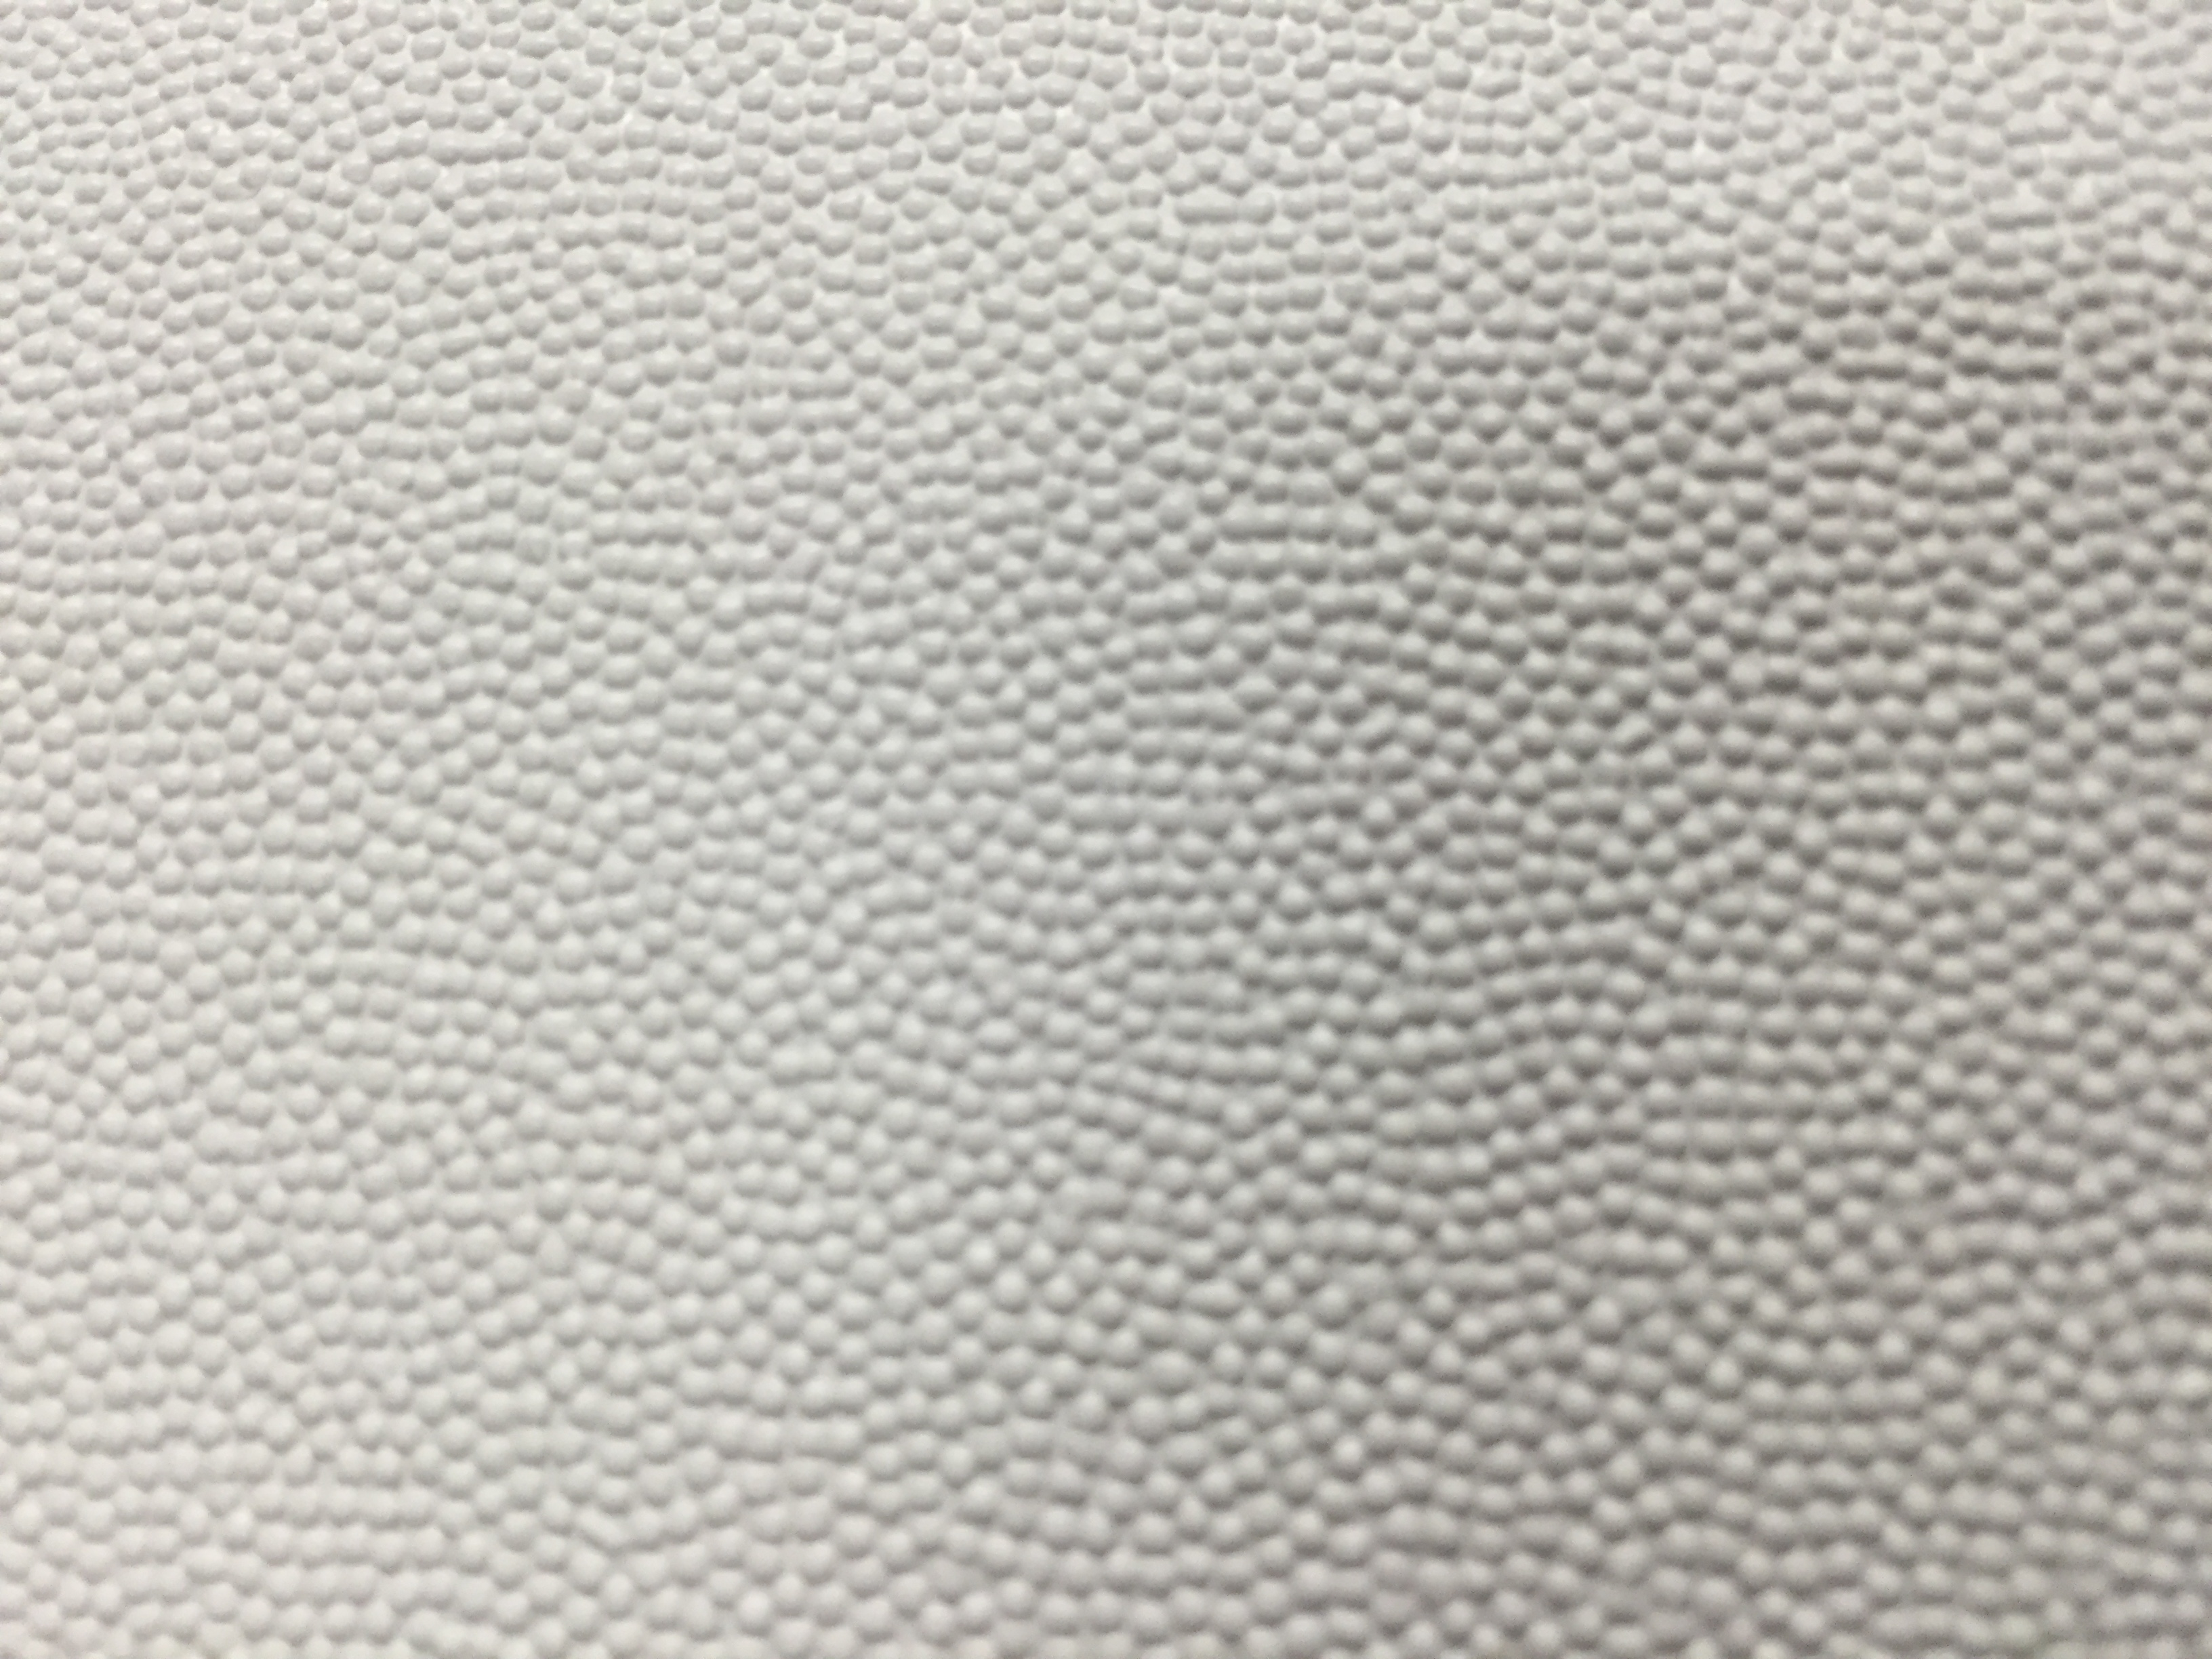 Dot Texture Wallpaper Printology Signs amp Graphics